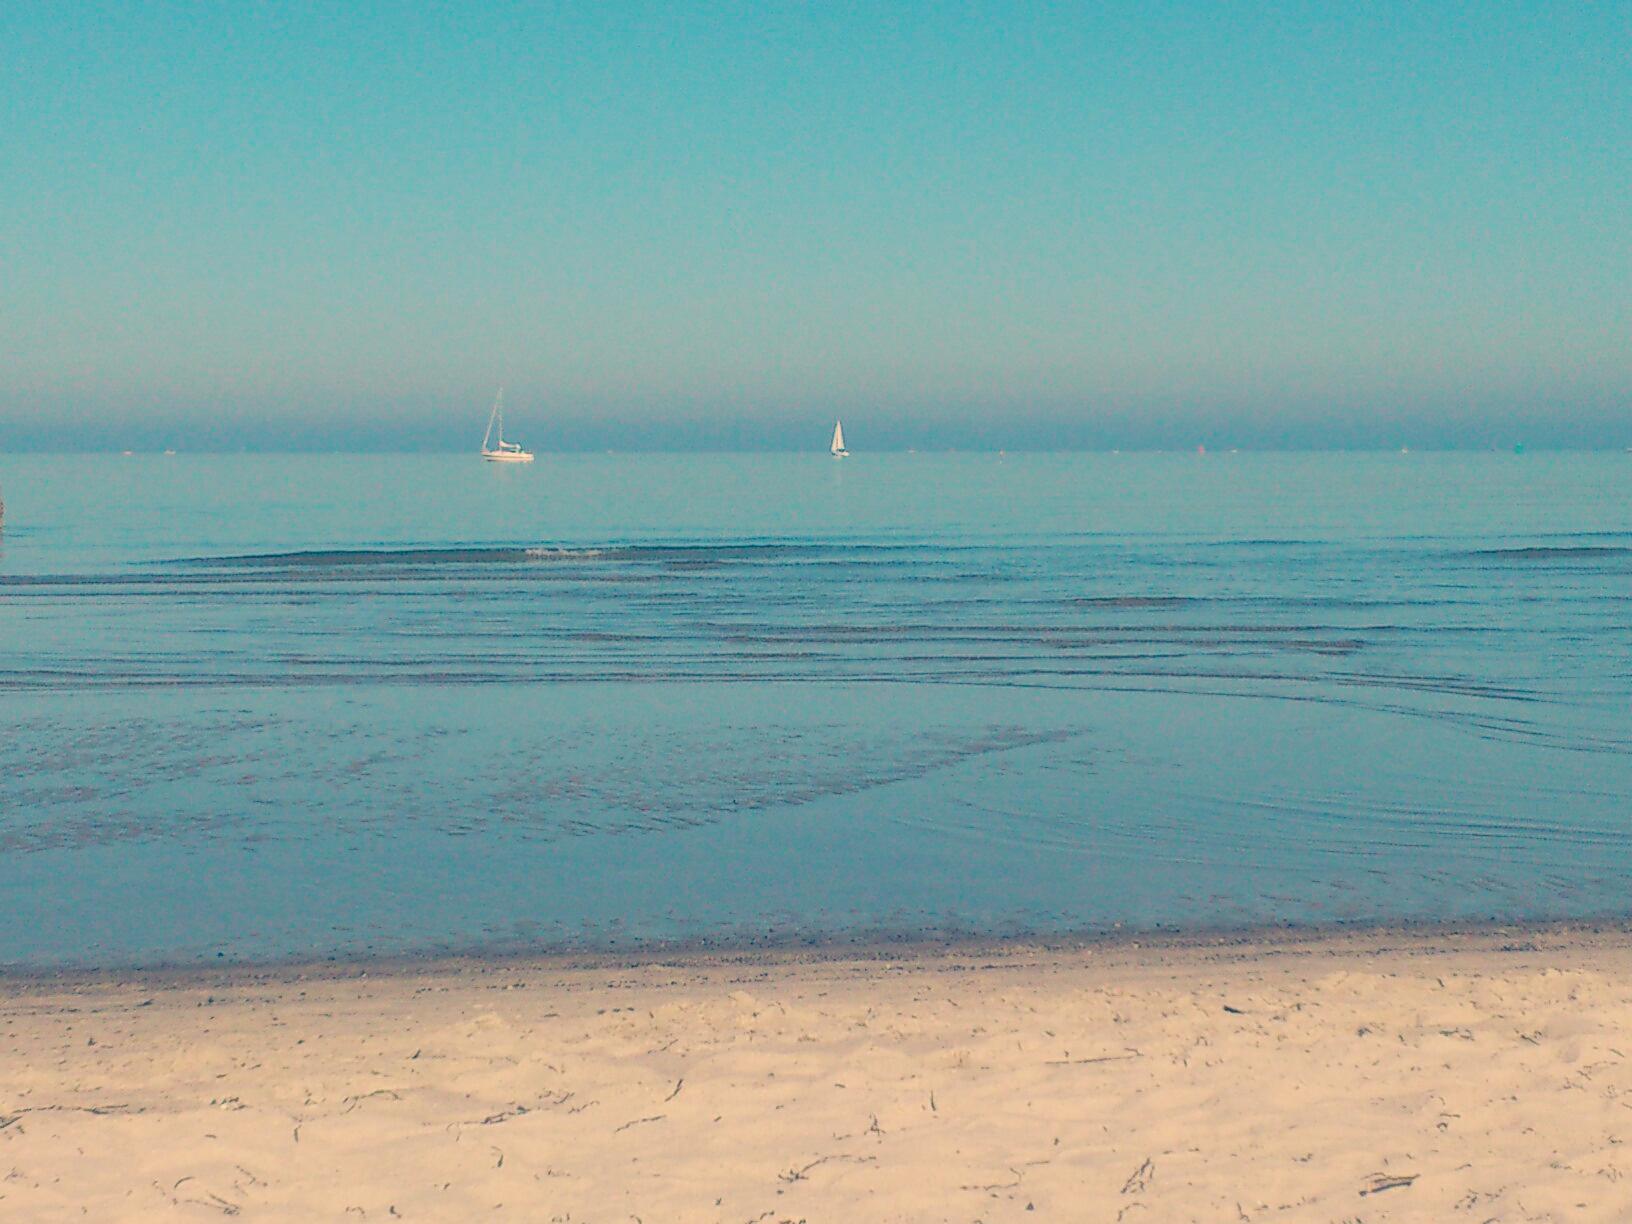 ich liebe das meer beach nature summer travel photogra. Black Bedroom Furniture Sets. Home Design Ideas